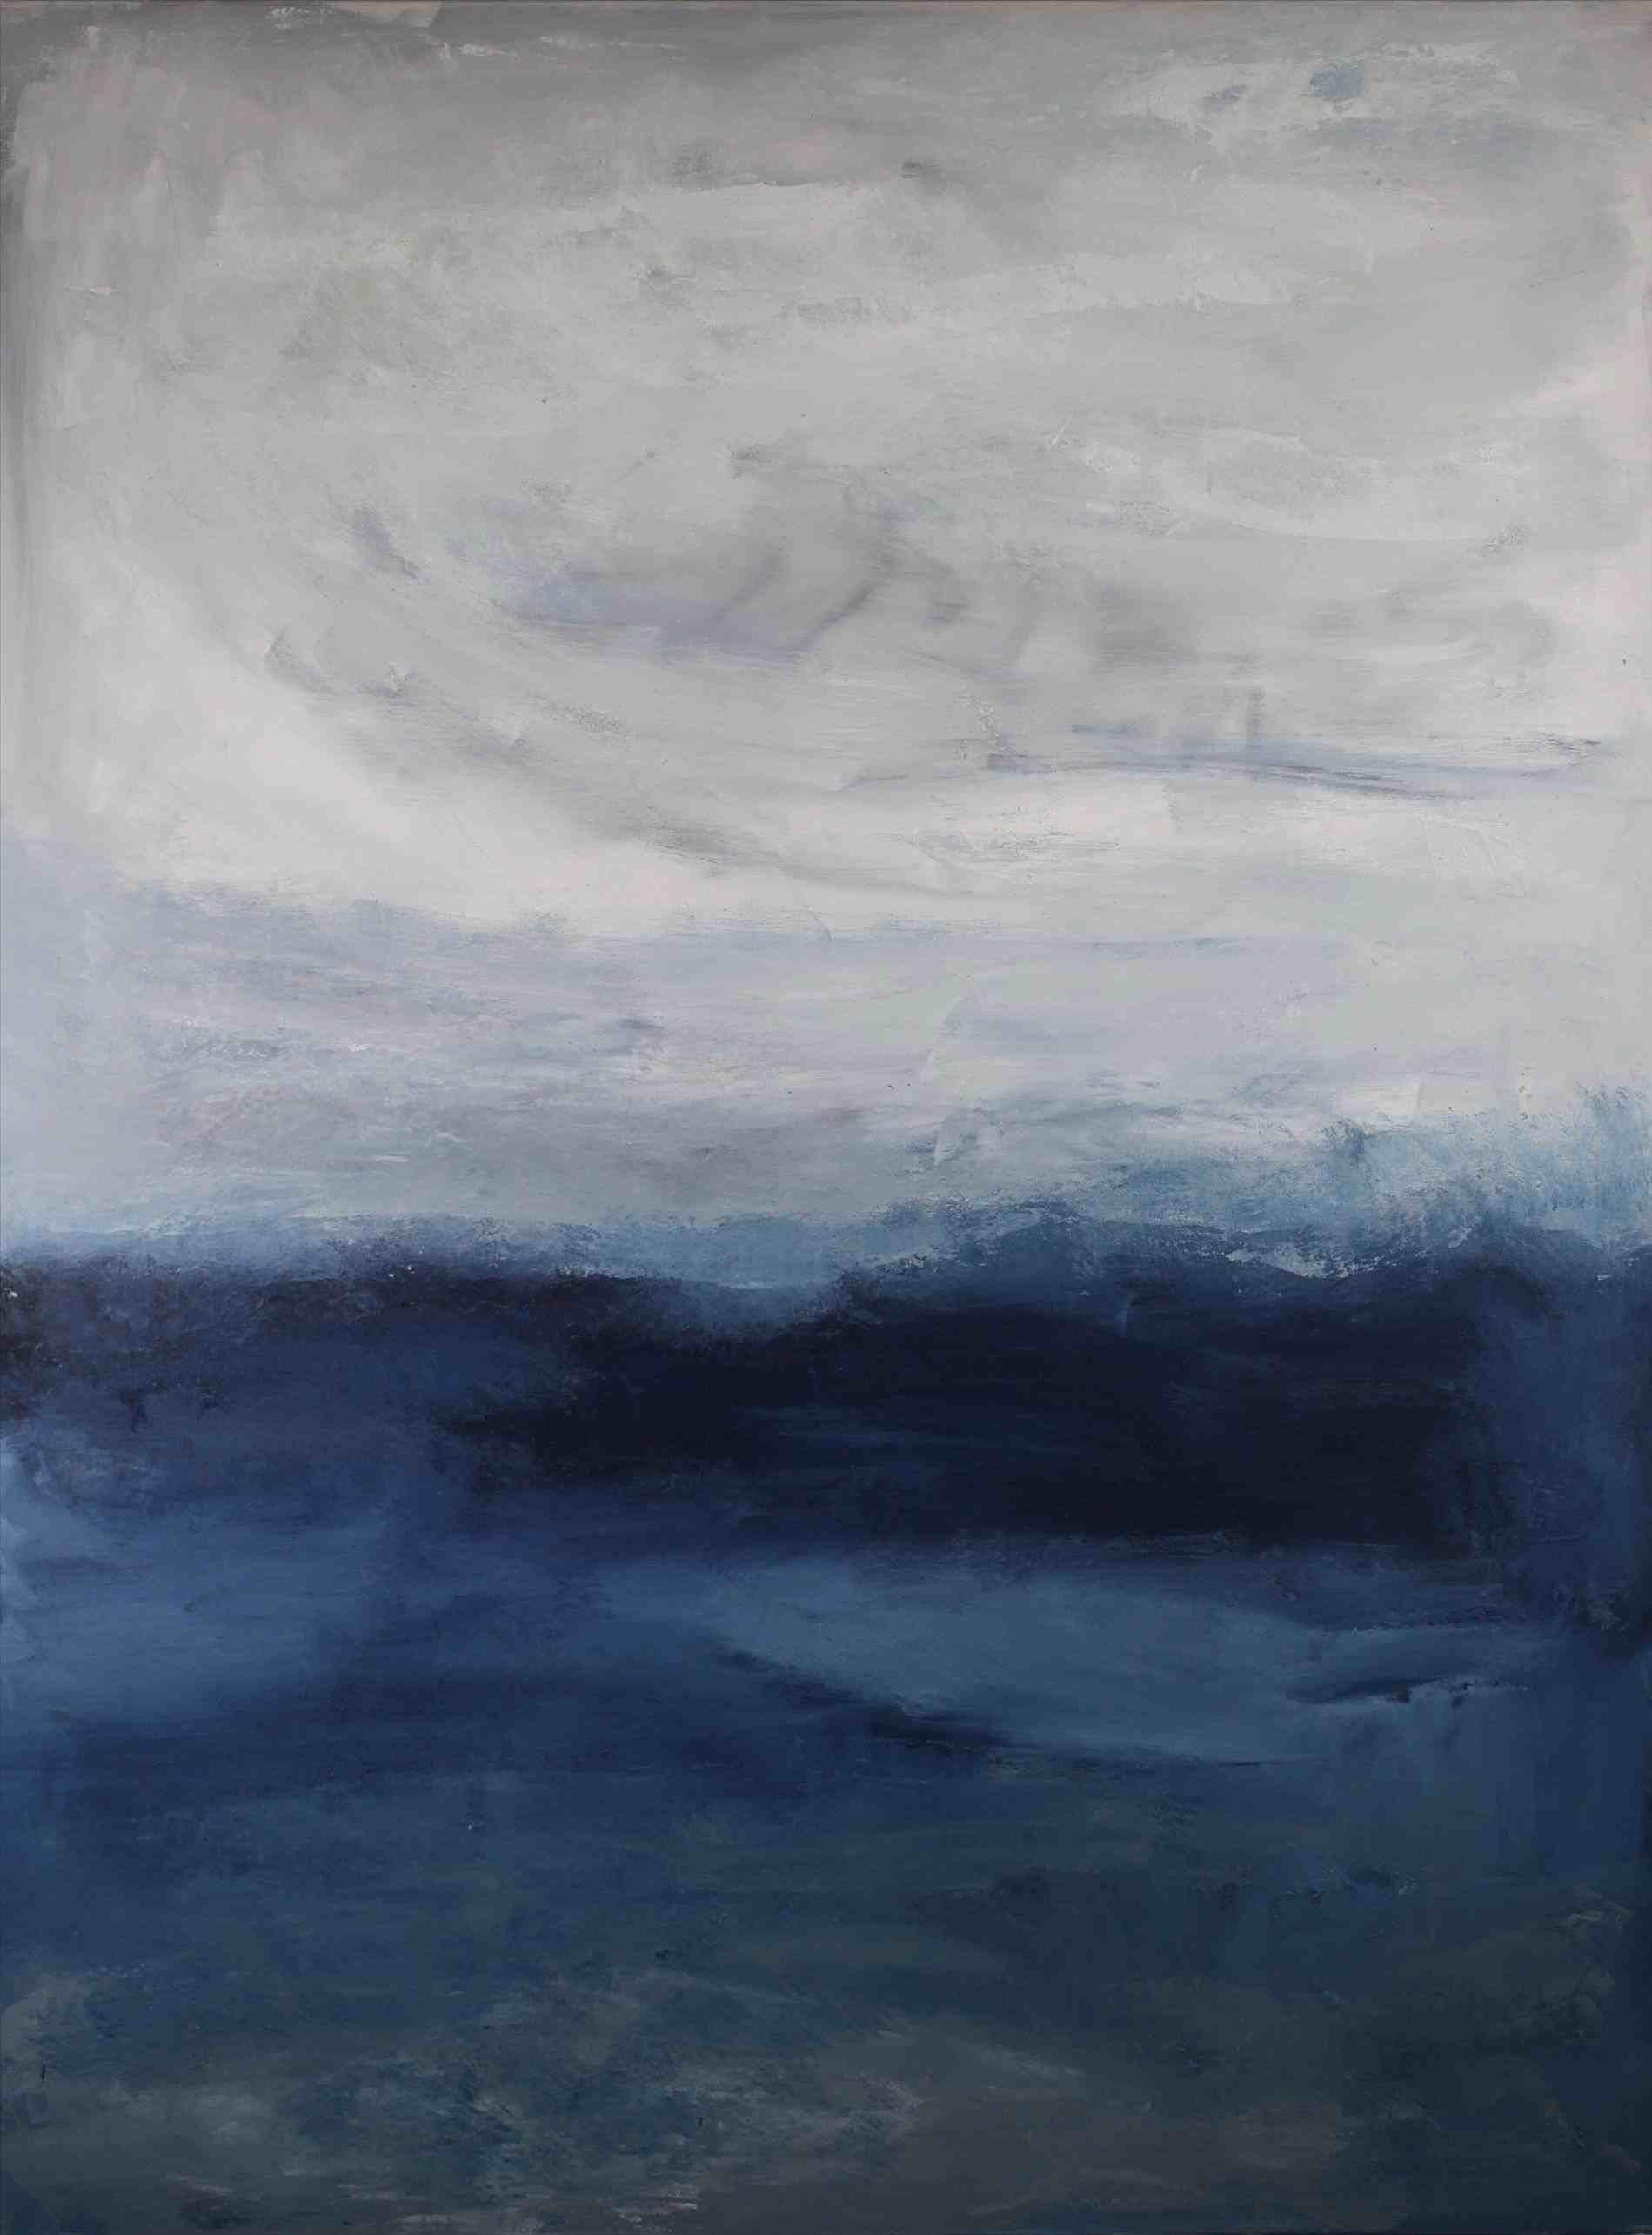 Abstract Ocean Landscape Painting Ocean Landscape Painting Abstract Abstract Art Painting Diy